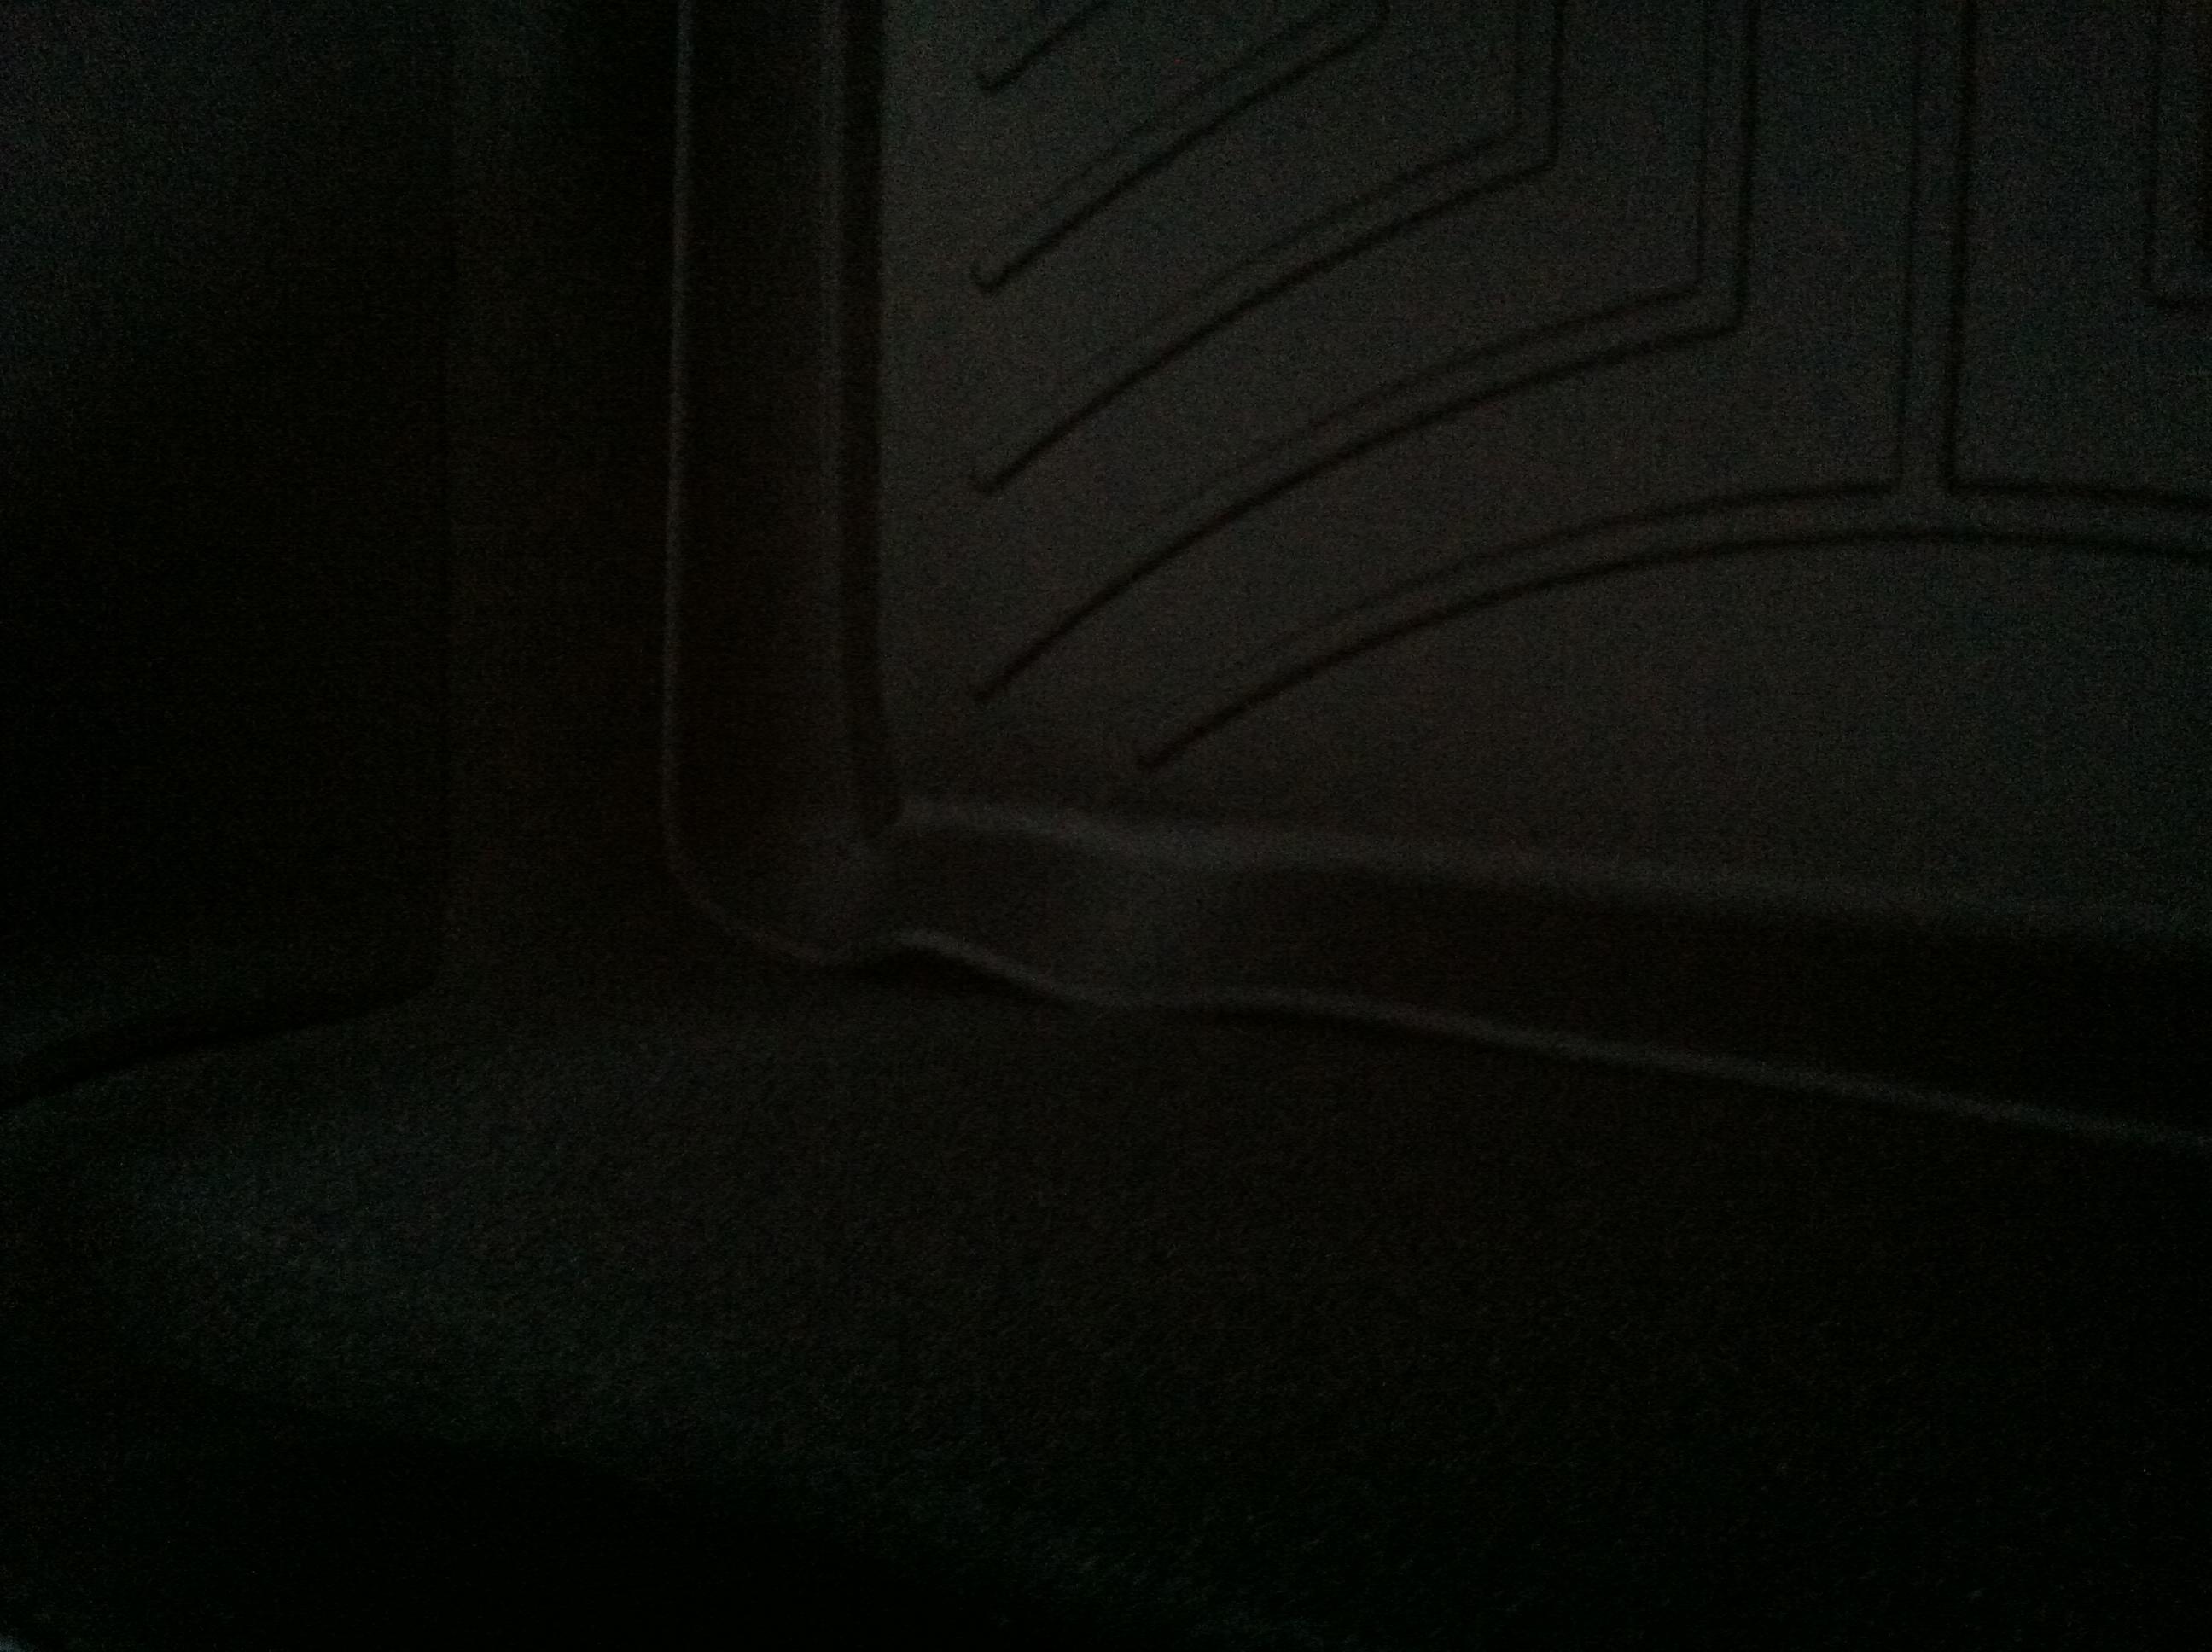 Weathertech floor mats brampton - Weathertech Installed Pics Photo 17 Jpg